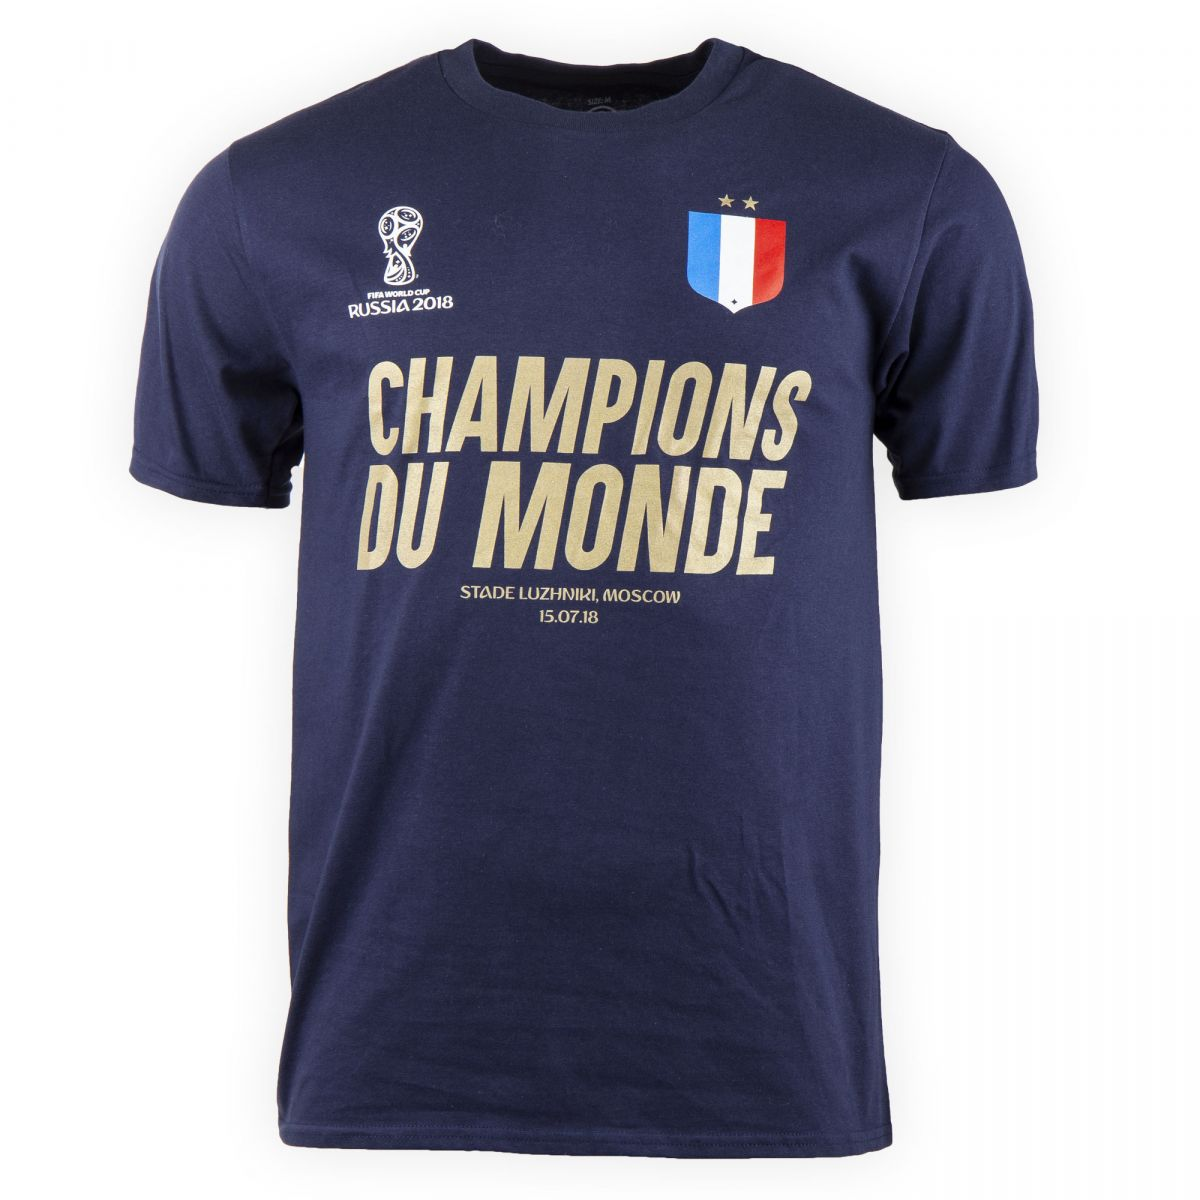 tee shirt champions du monde homme fifa prix d griff. Black Bedroom Furniture Sets. Home Design Ideas